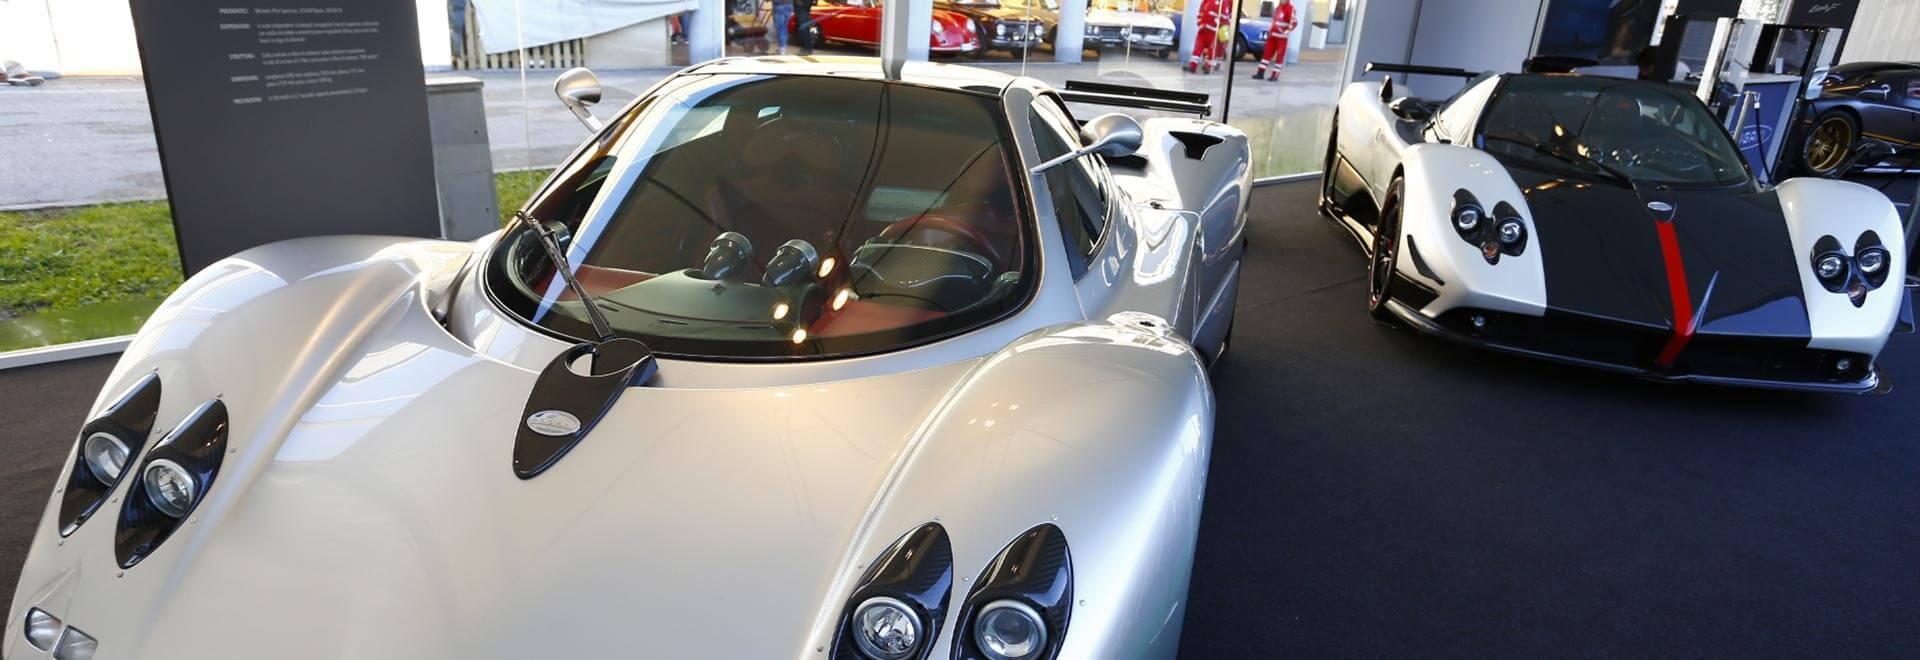 Pagani Cars And Motors Today Auto E Moto D Epoca 24 25 26 27